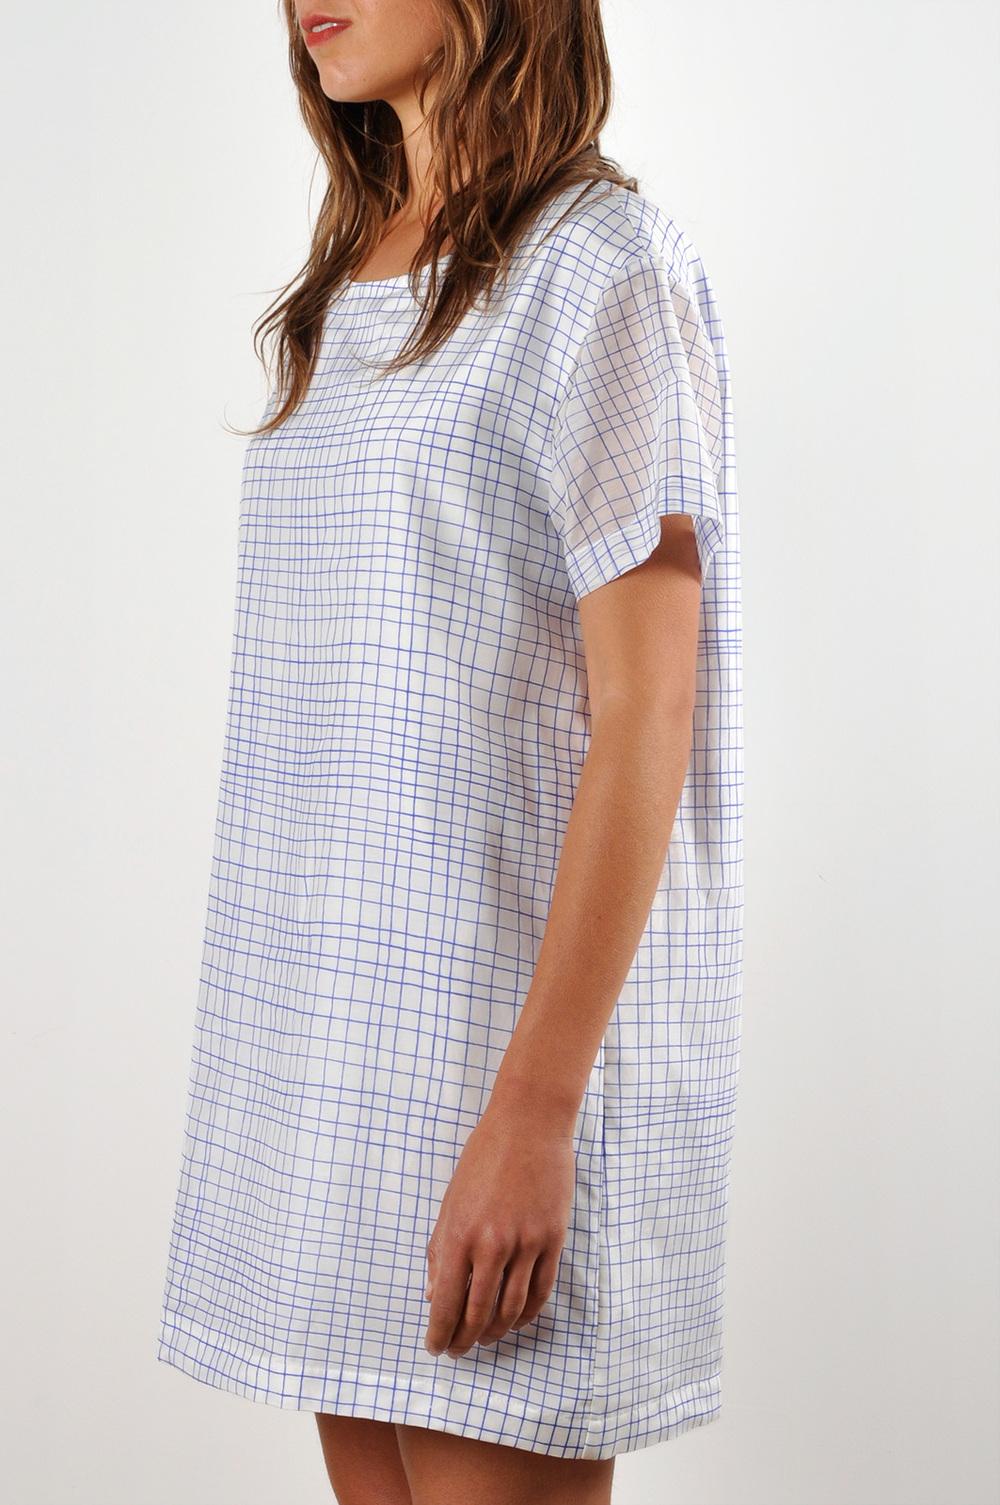 Waltzdrop Shoulder T-shirt Dress In Grid Print Cotton Silk